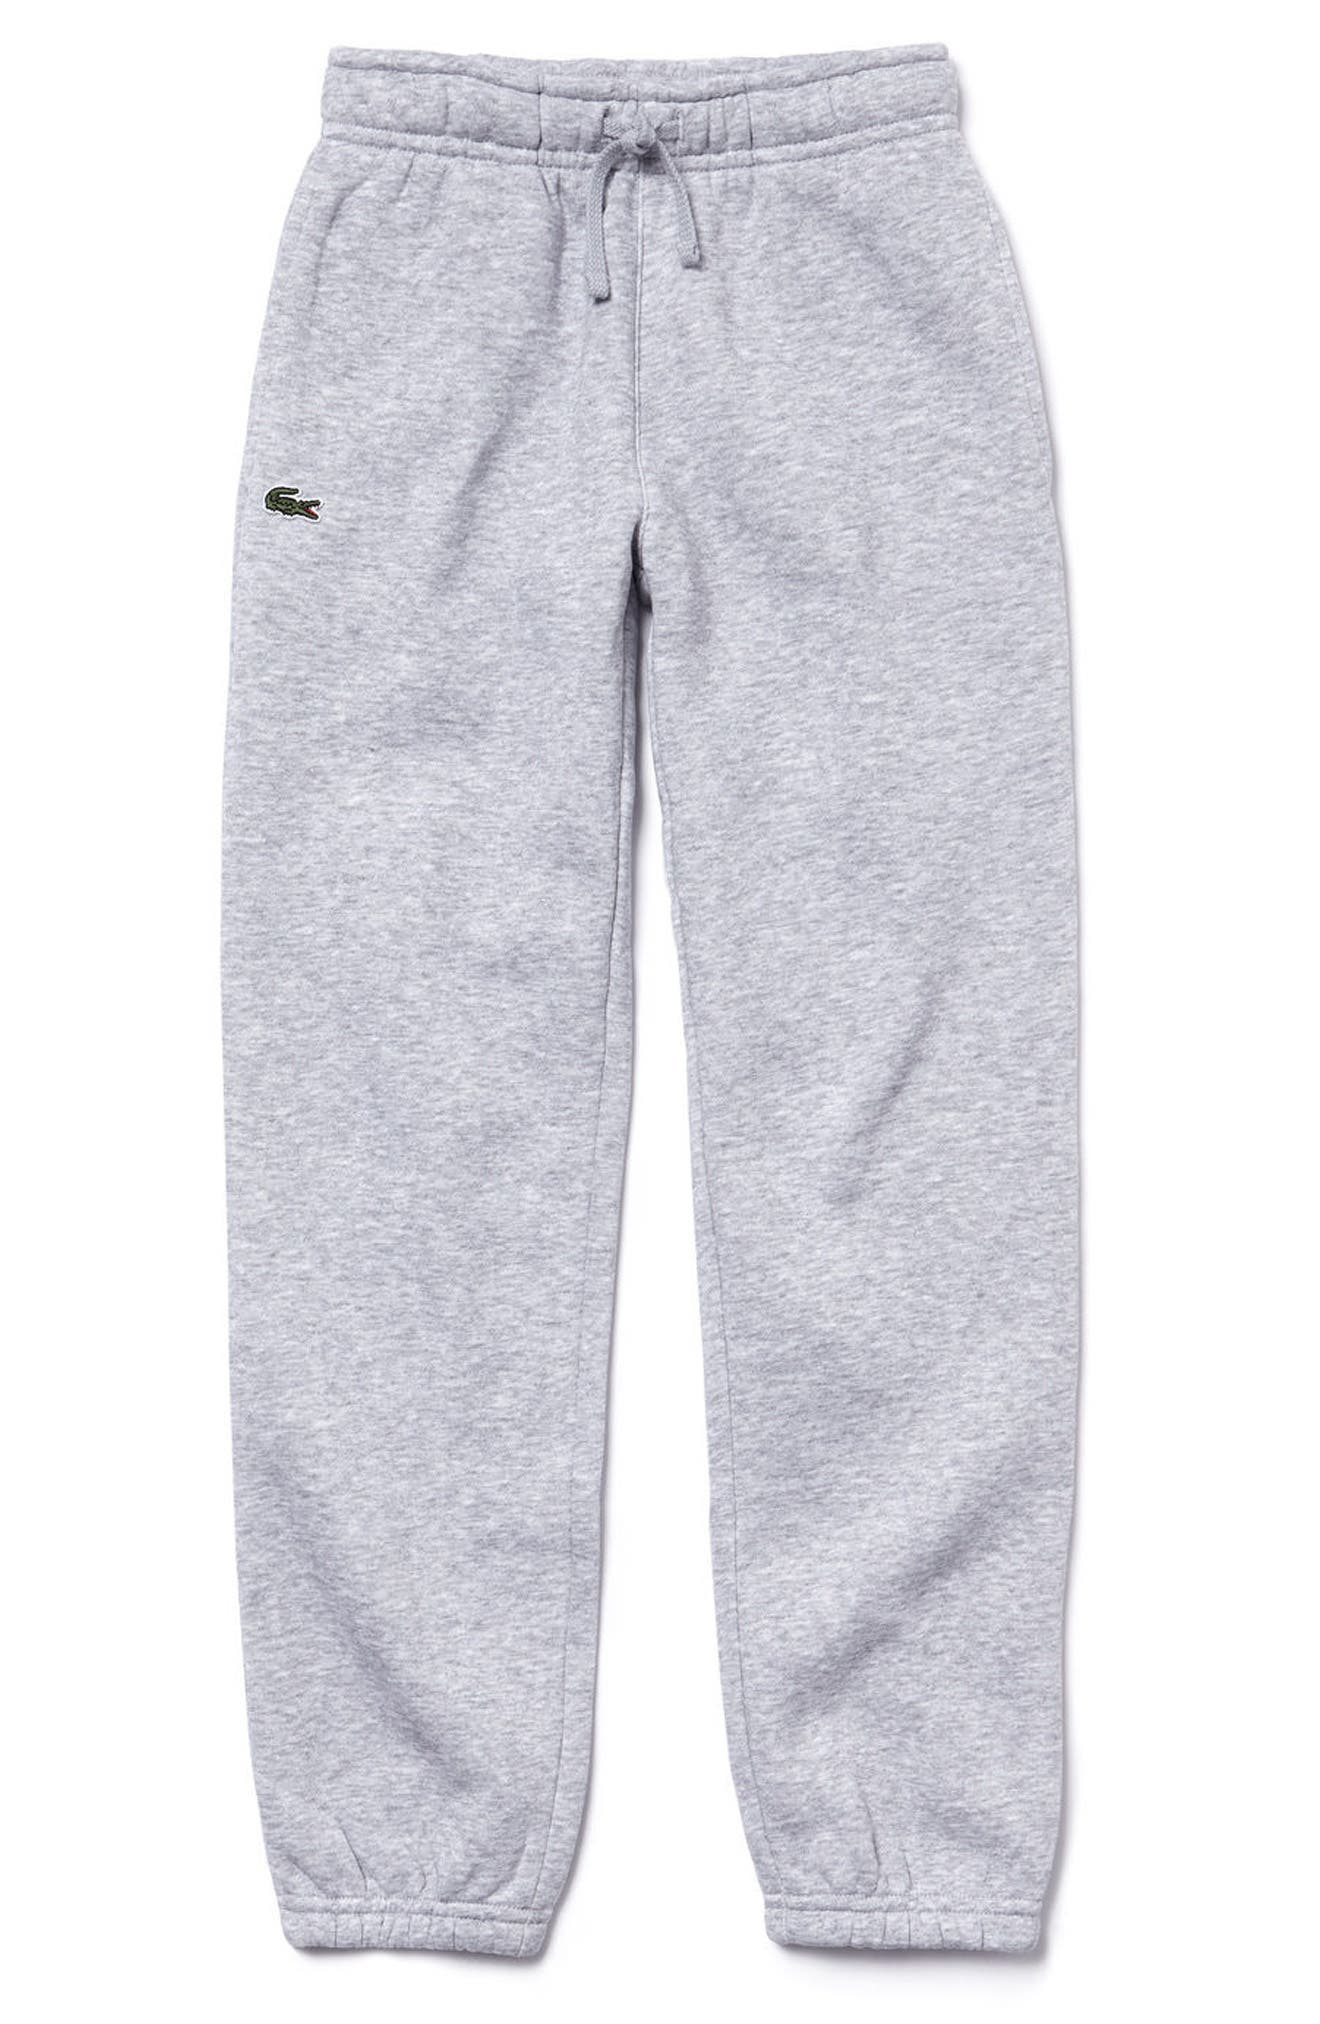 Sport Sweatpants,                         Main,                         color, Silver Grey Chine